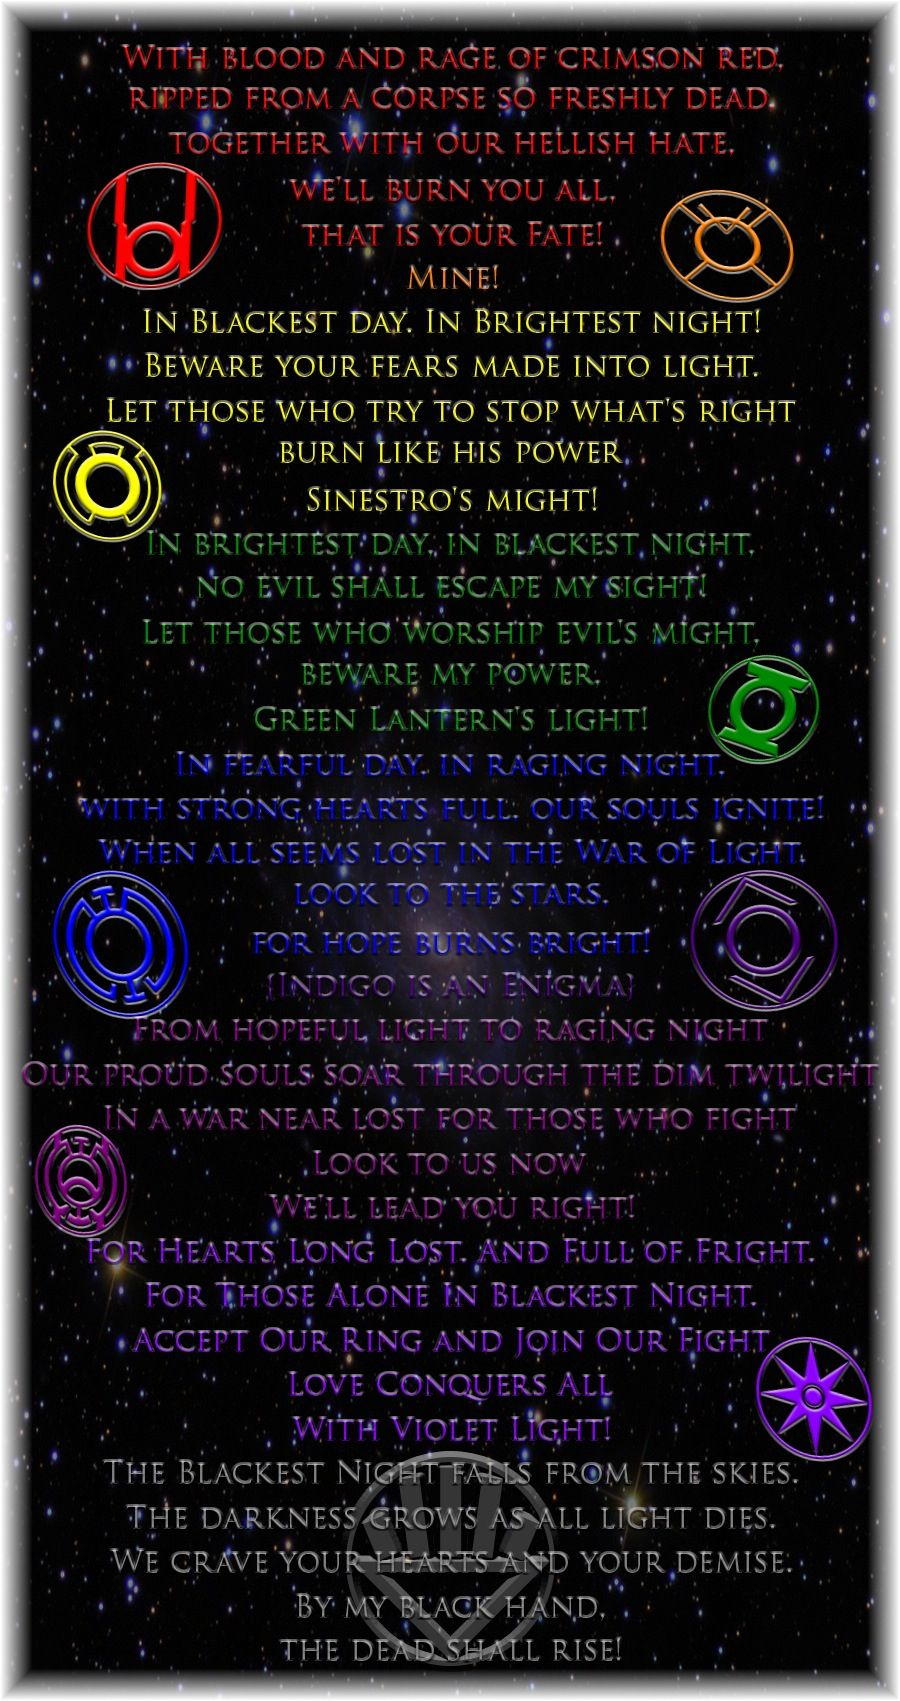 Lantern corp oaths   Lanterns, Lantern corps oaths, Blue ...